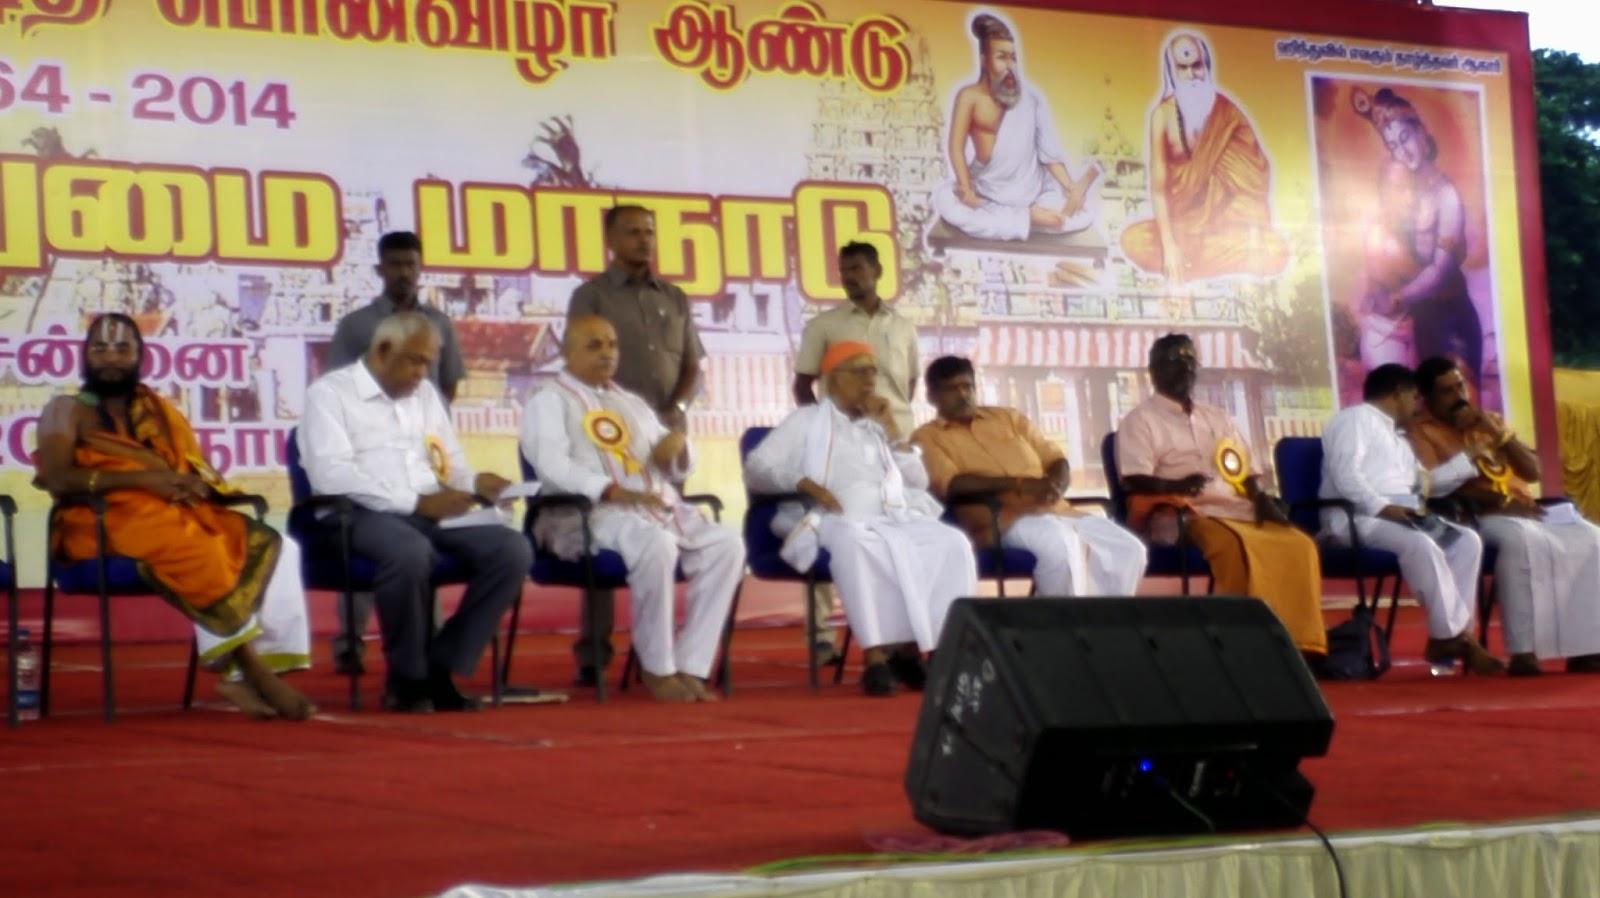 'VHP resolves to bring back the lost Hindu dignity and pride': Dr Togadia at Chennai